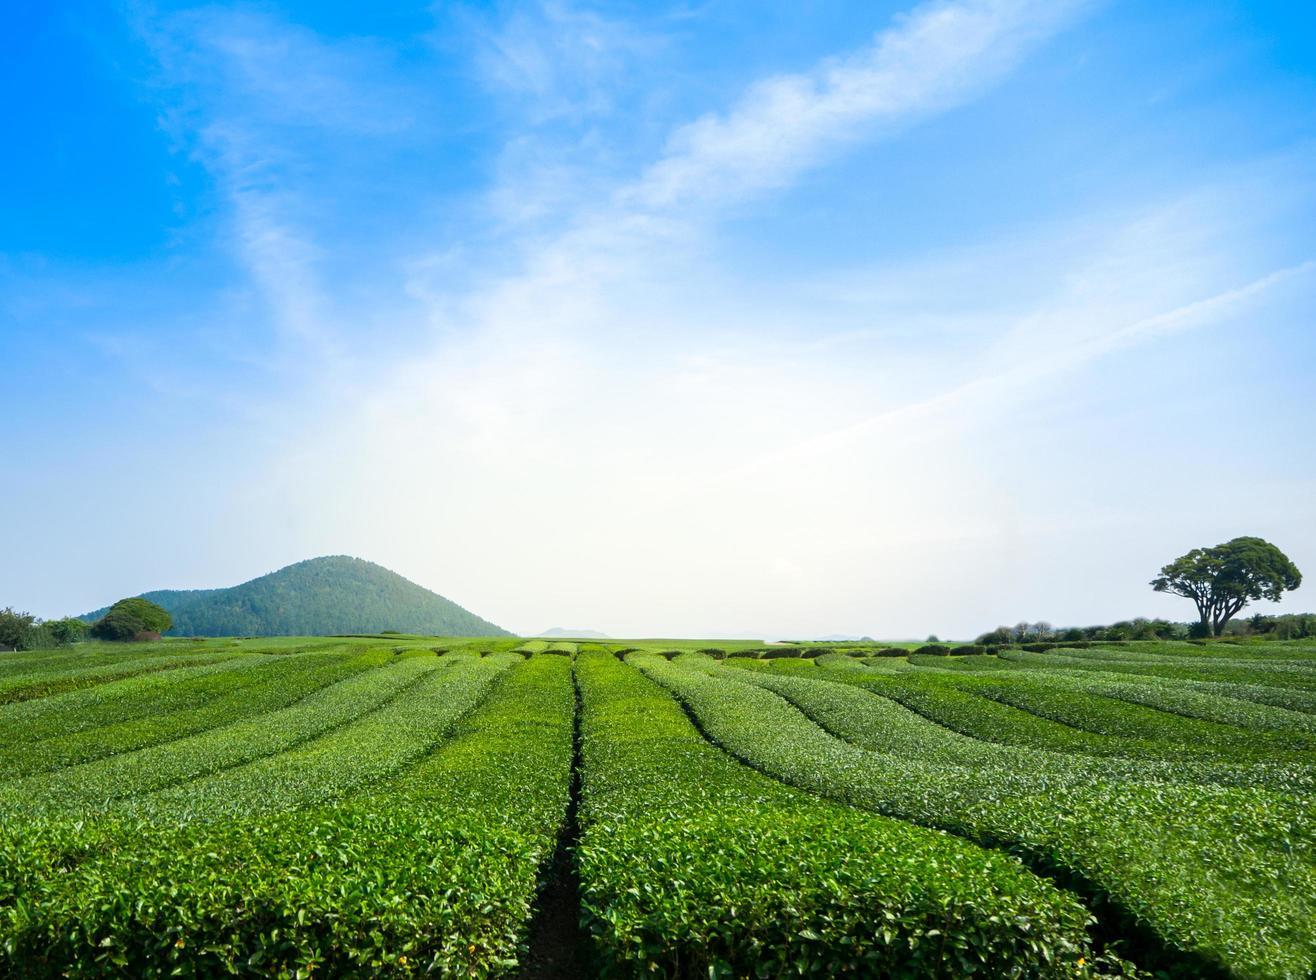 Beautiful view of green tea field with sky at Jeju, South Korea photo